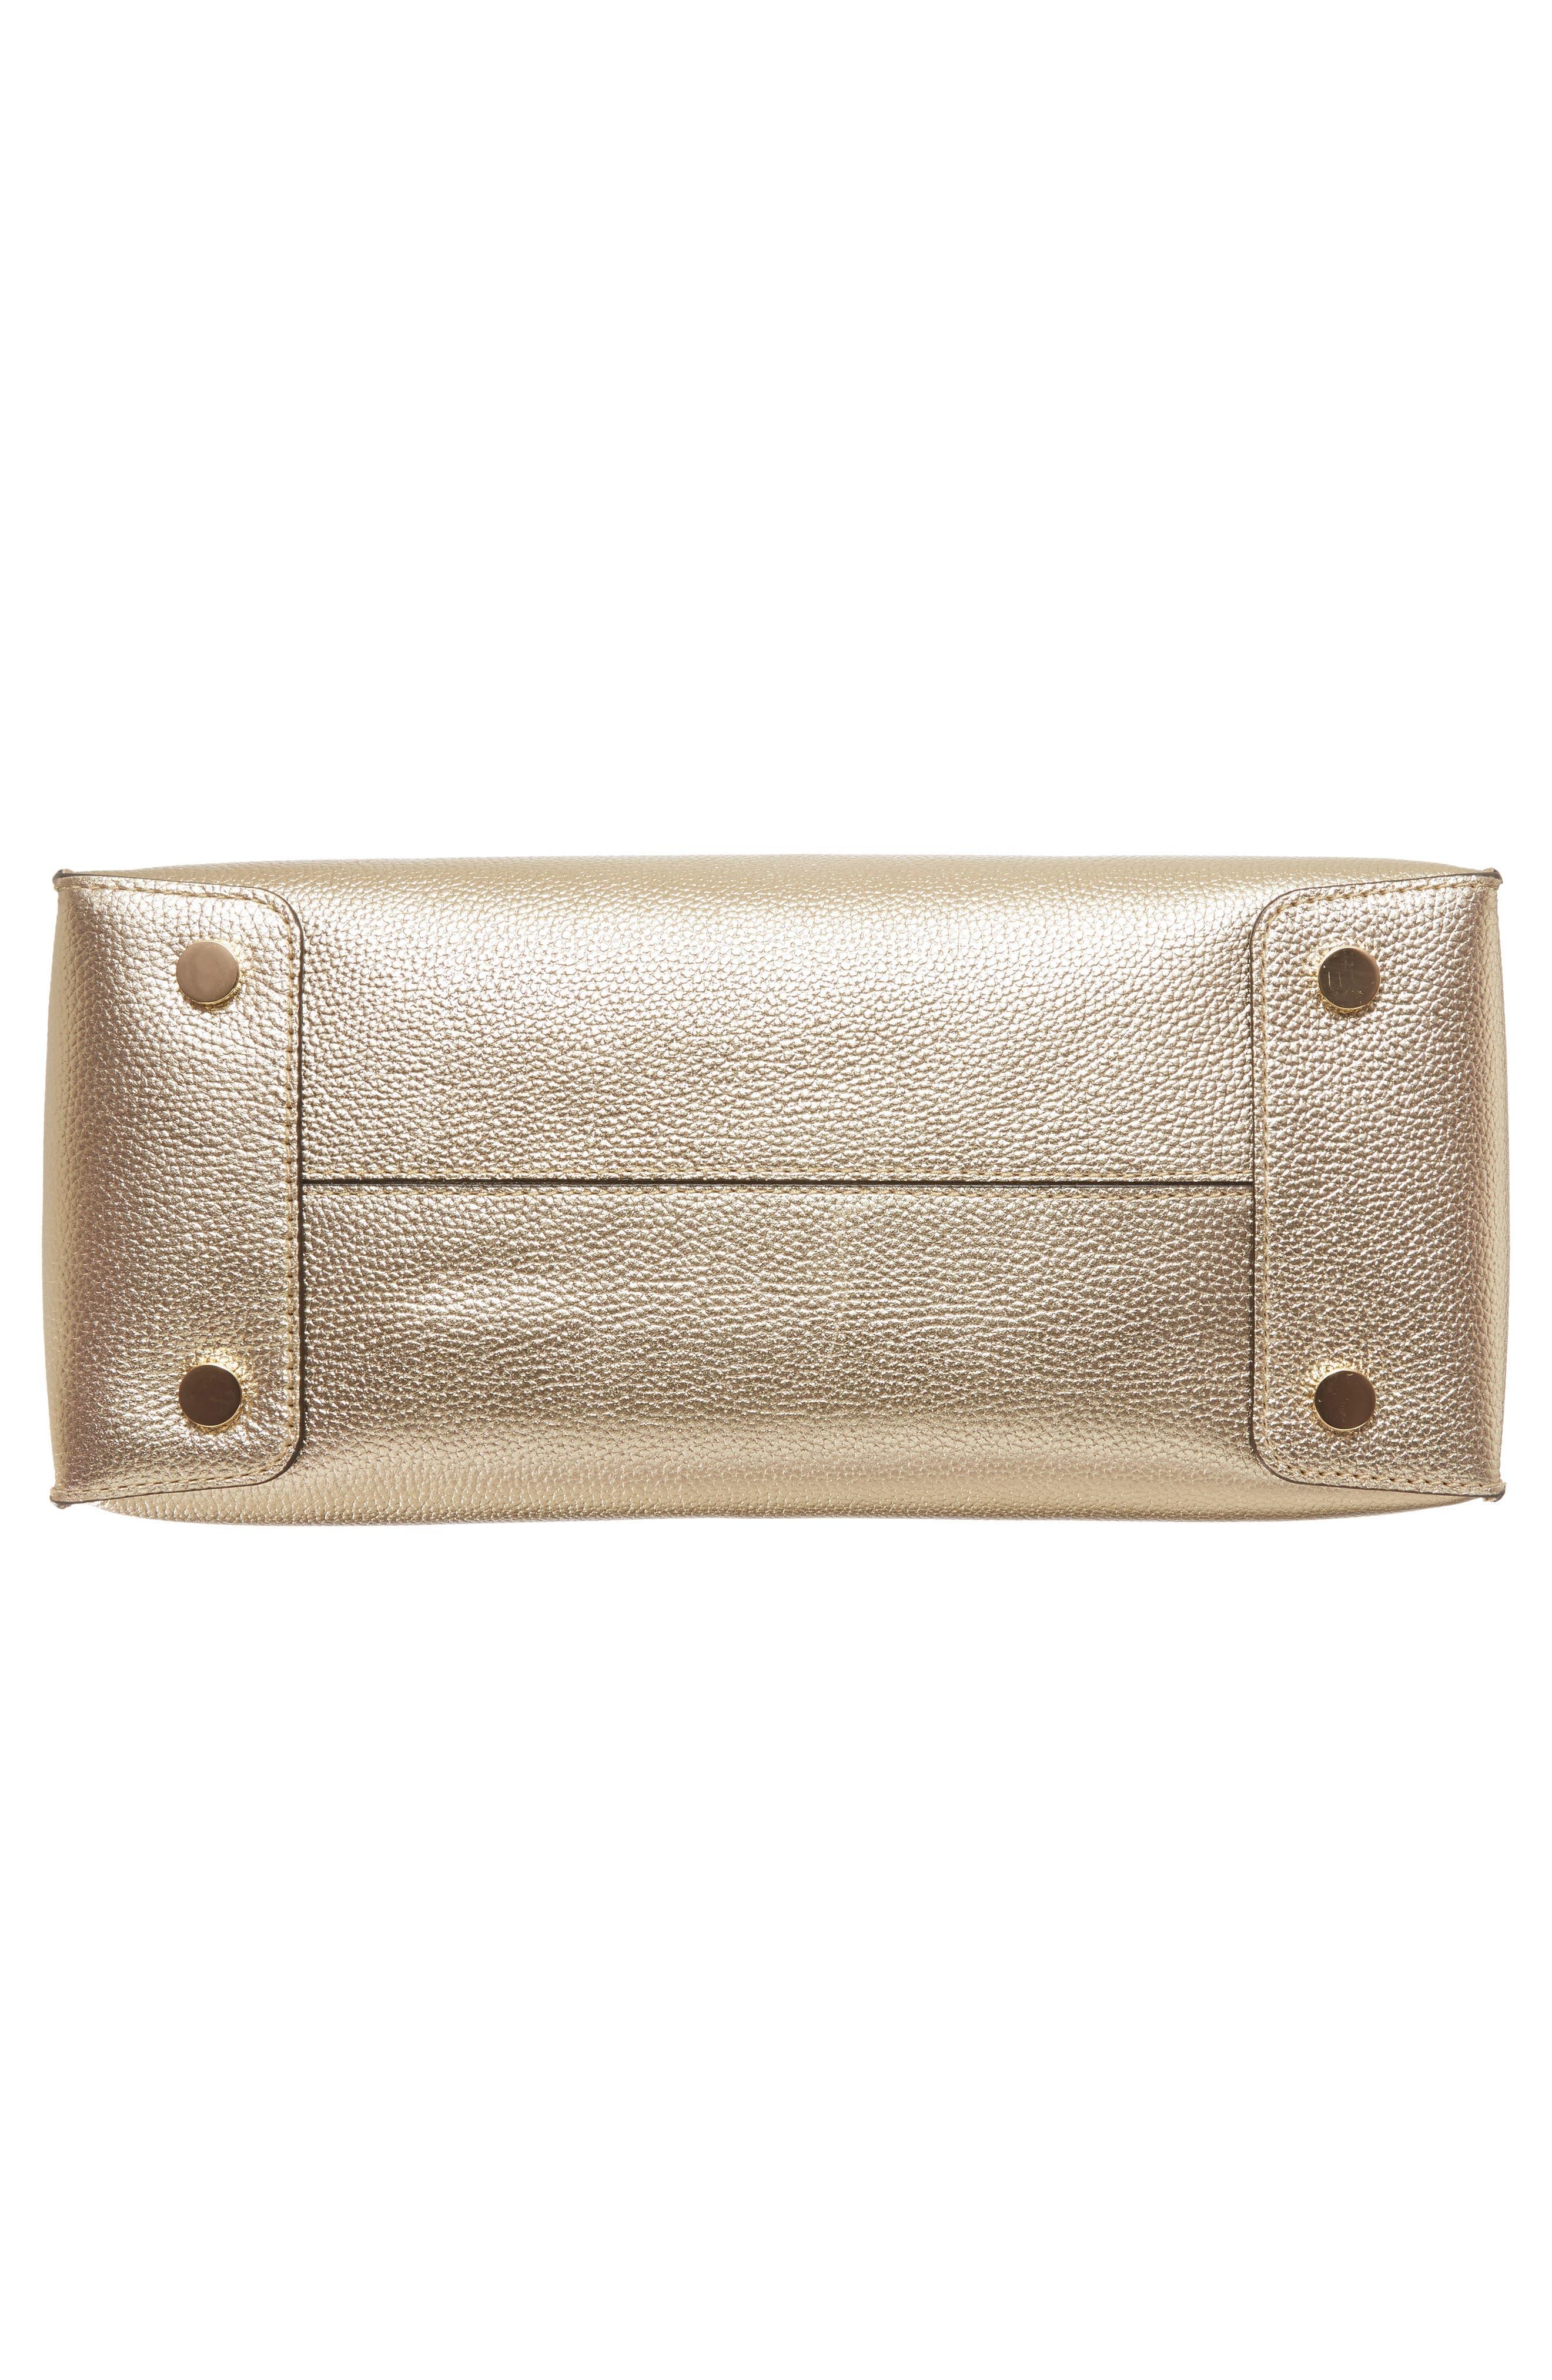 Large Mercer Metallic Leather Tote,                             Alternate thumbnail 4, color,                             740